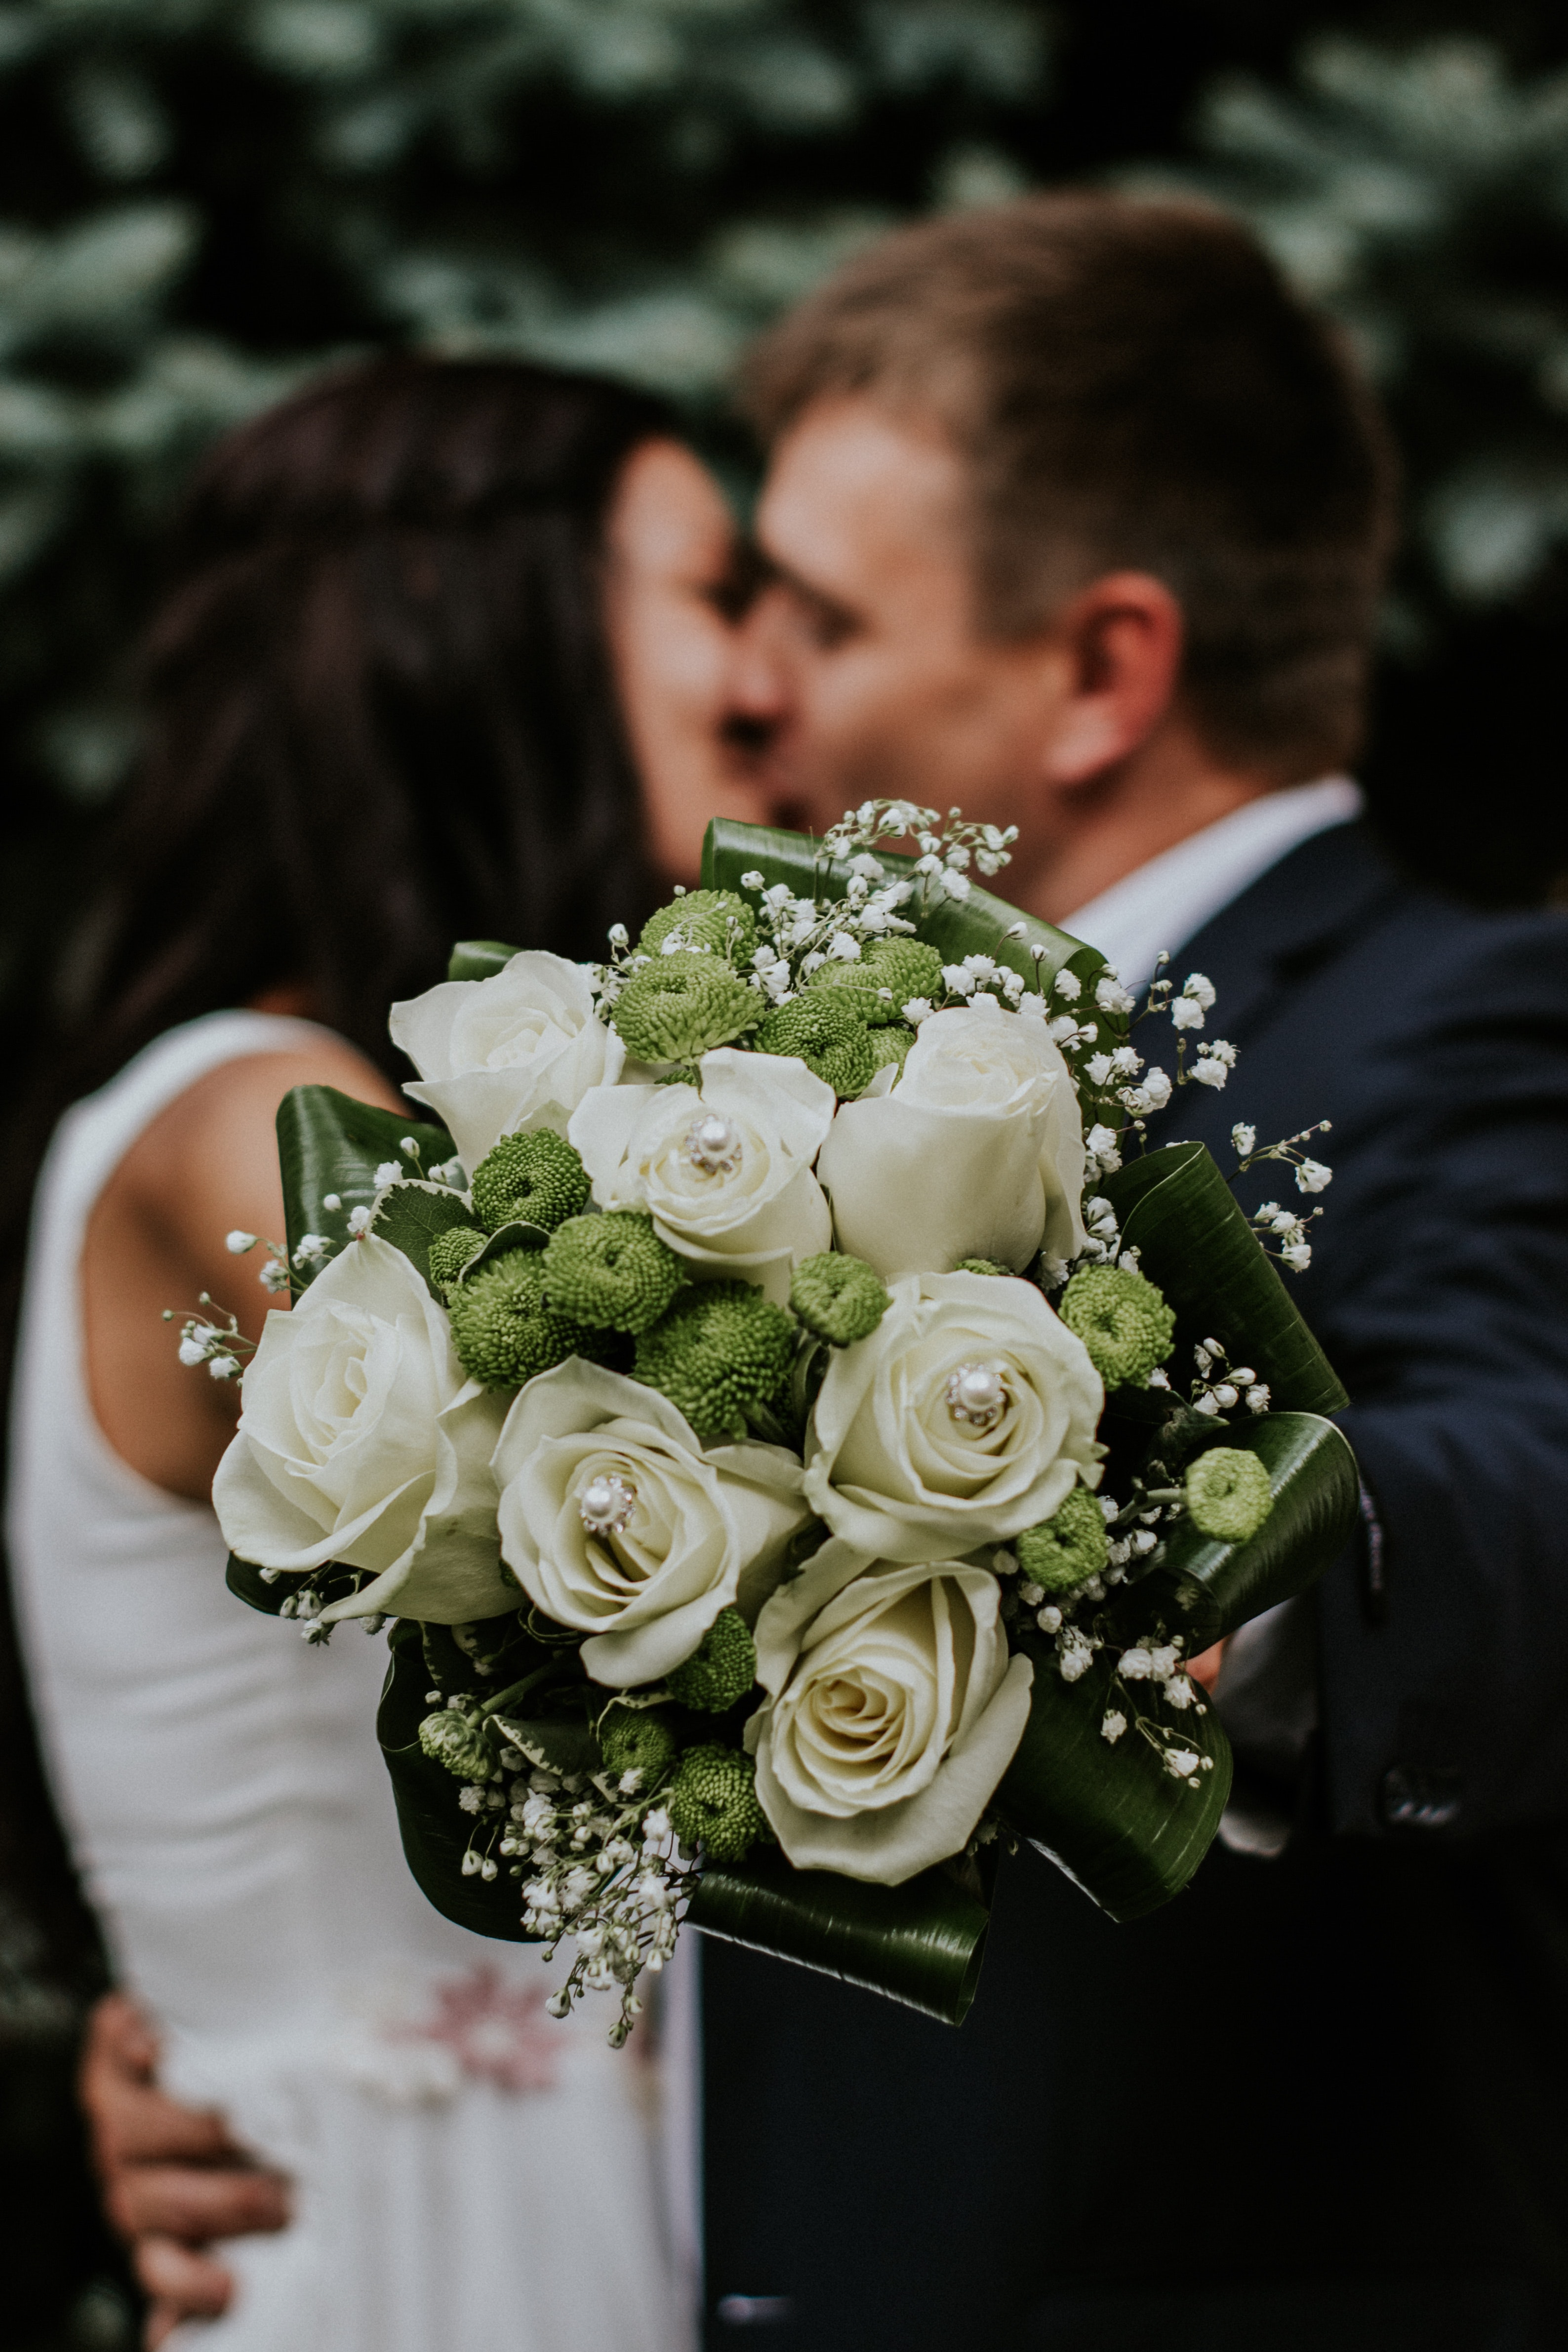 Why you need Wedding flowers?